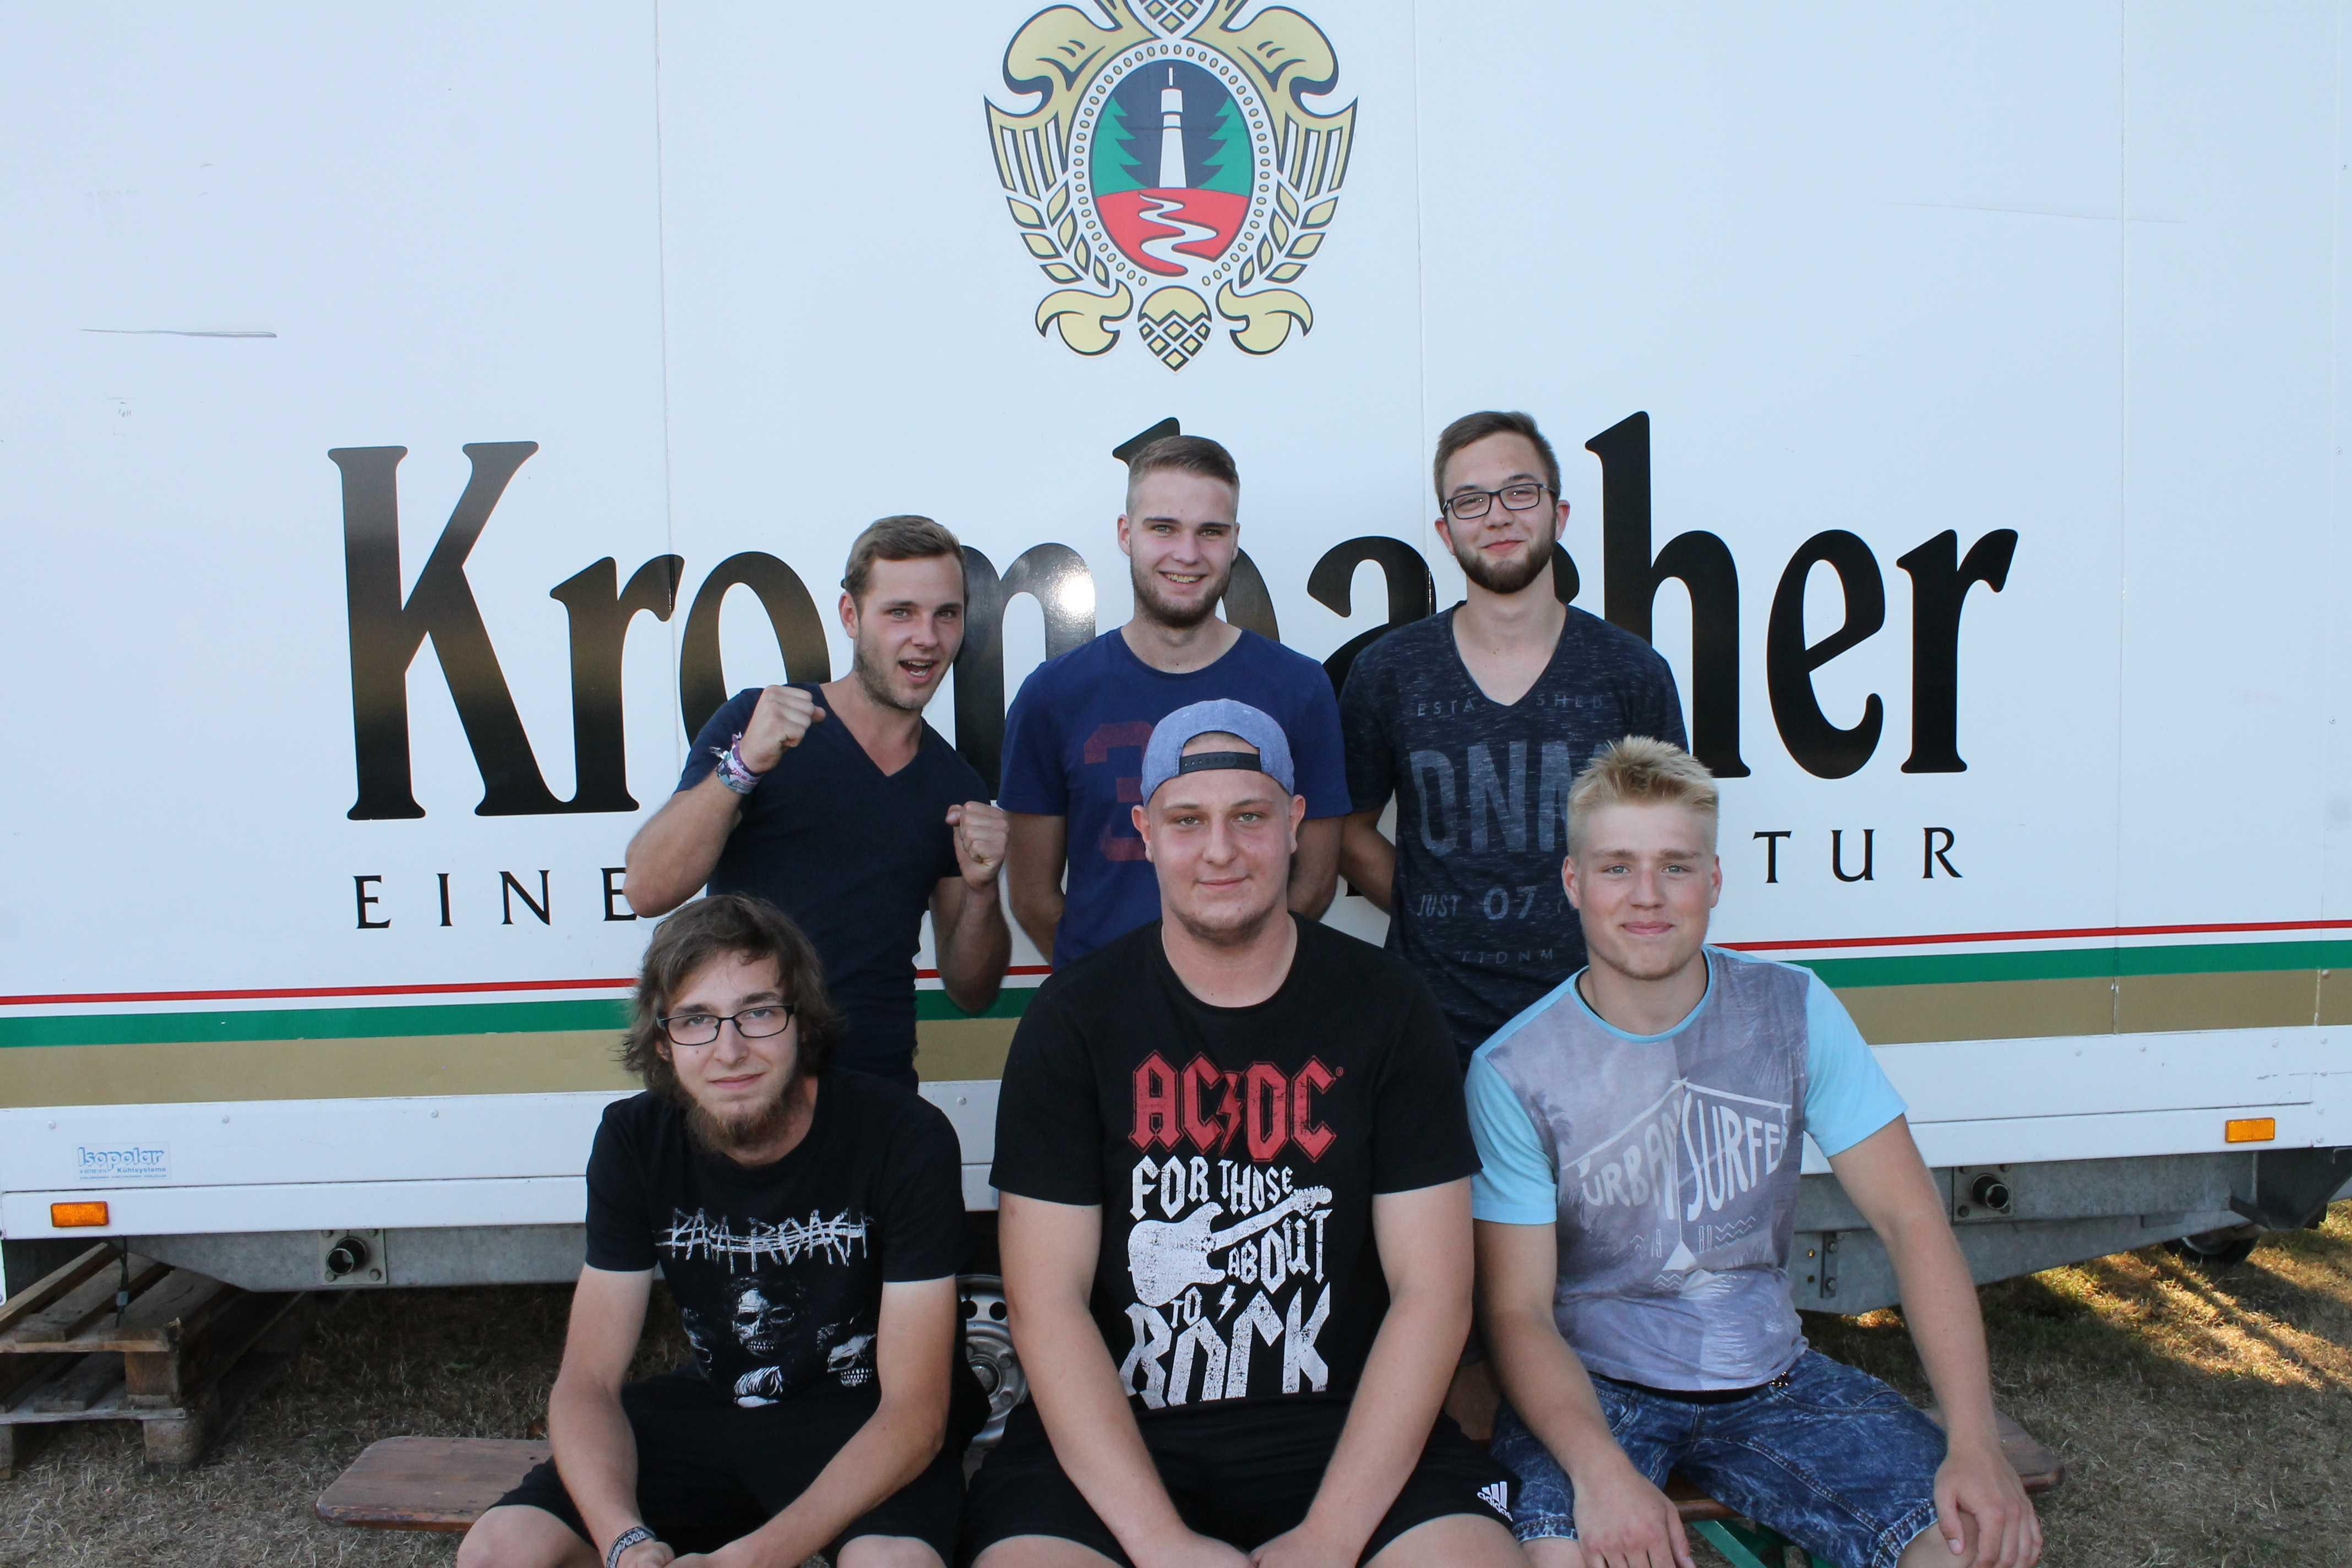 2018-07-27 Sportwoche - Flunkyball Turnier (16)